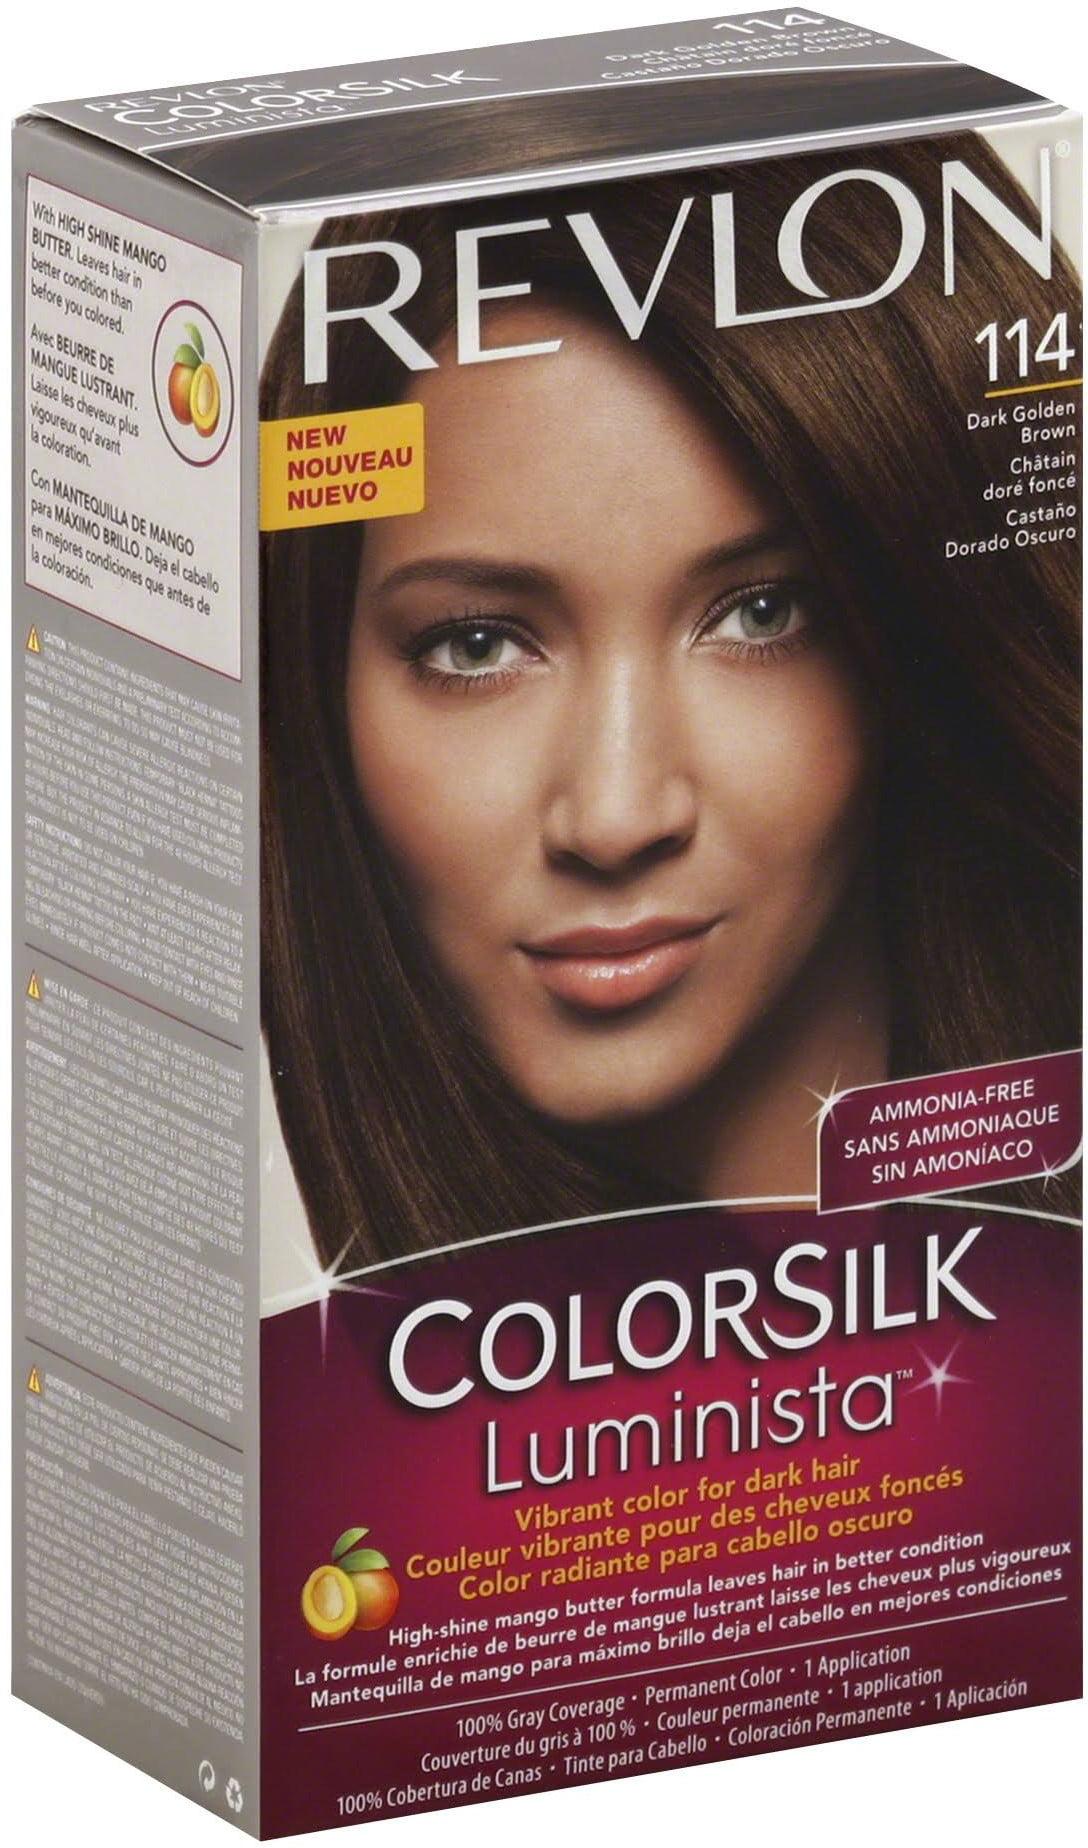 Revlon Colorsilk Luminista Hair Color 114 Dark Golden Brown 1 Ea Pack Of 6